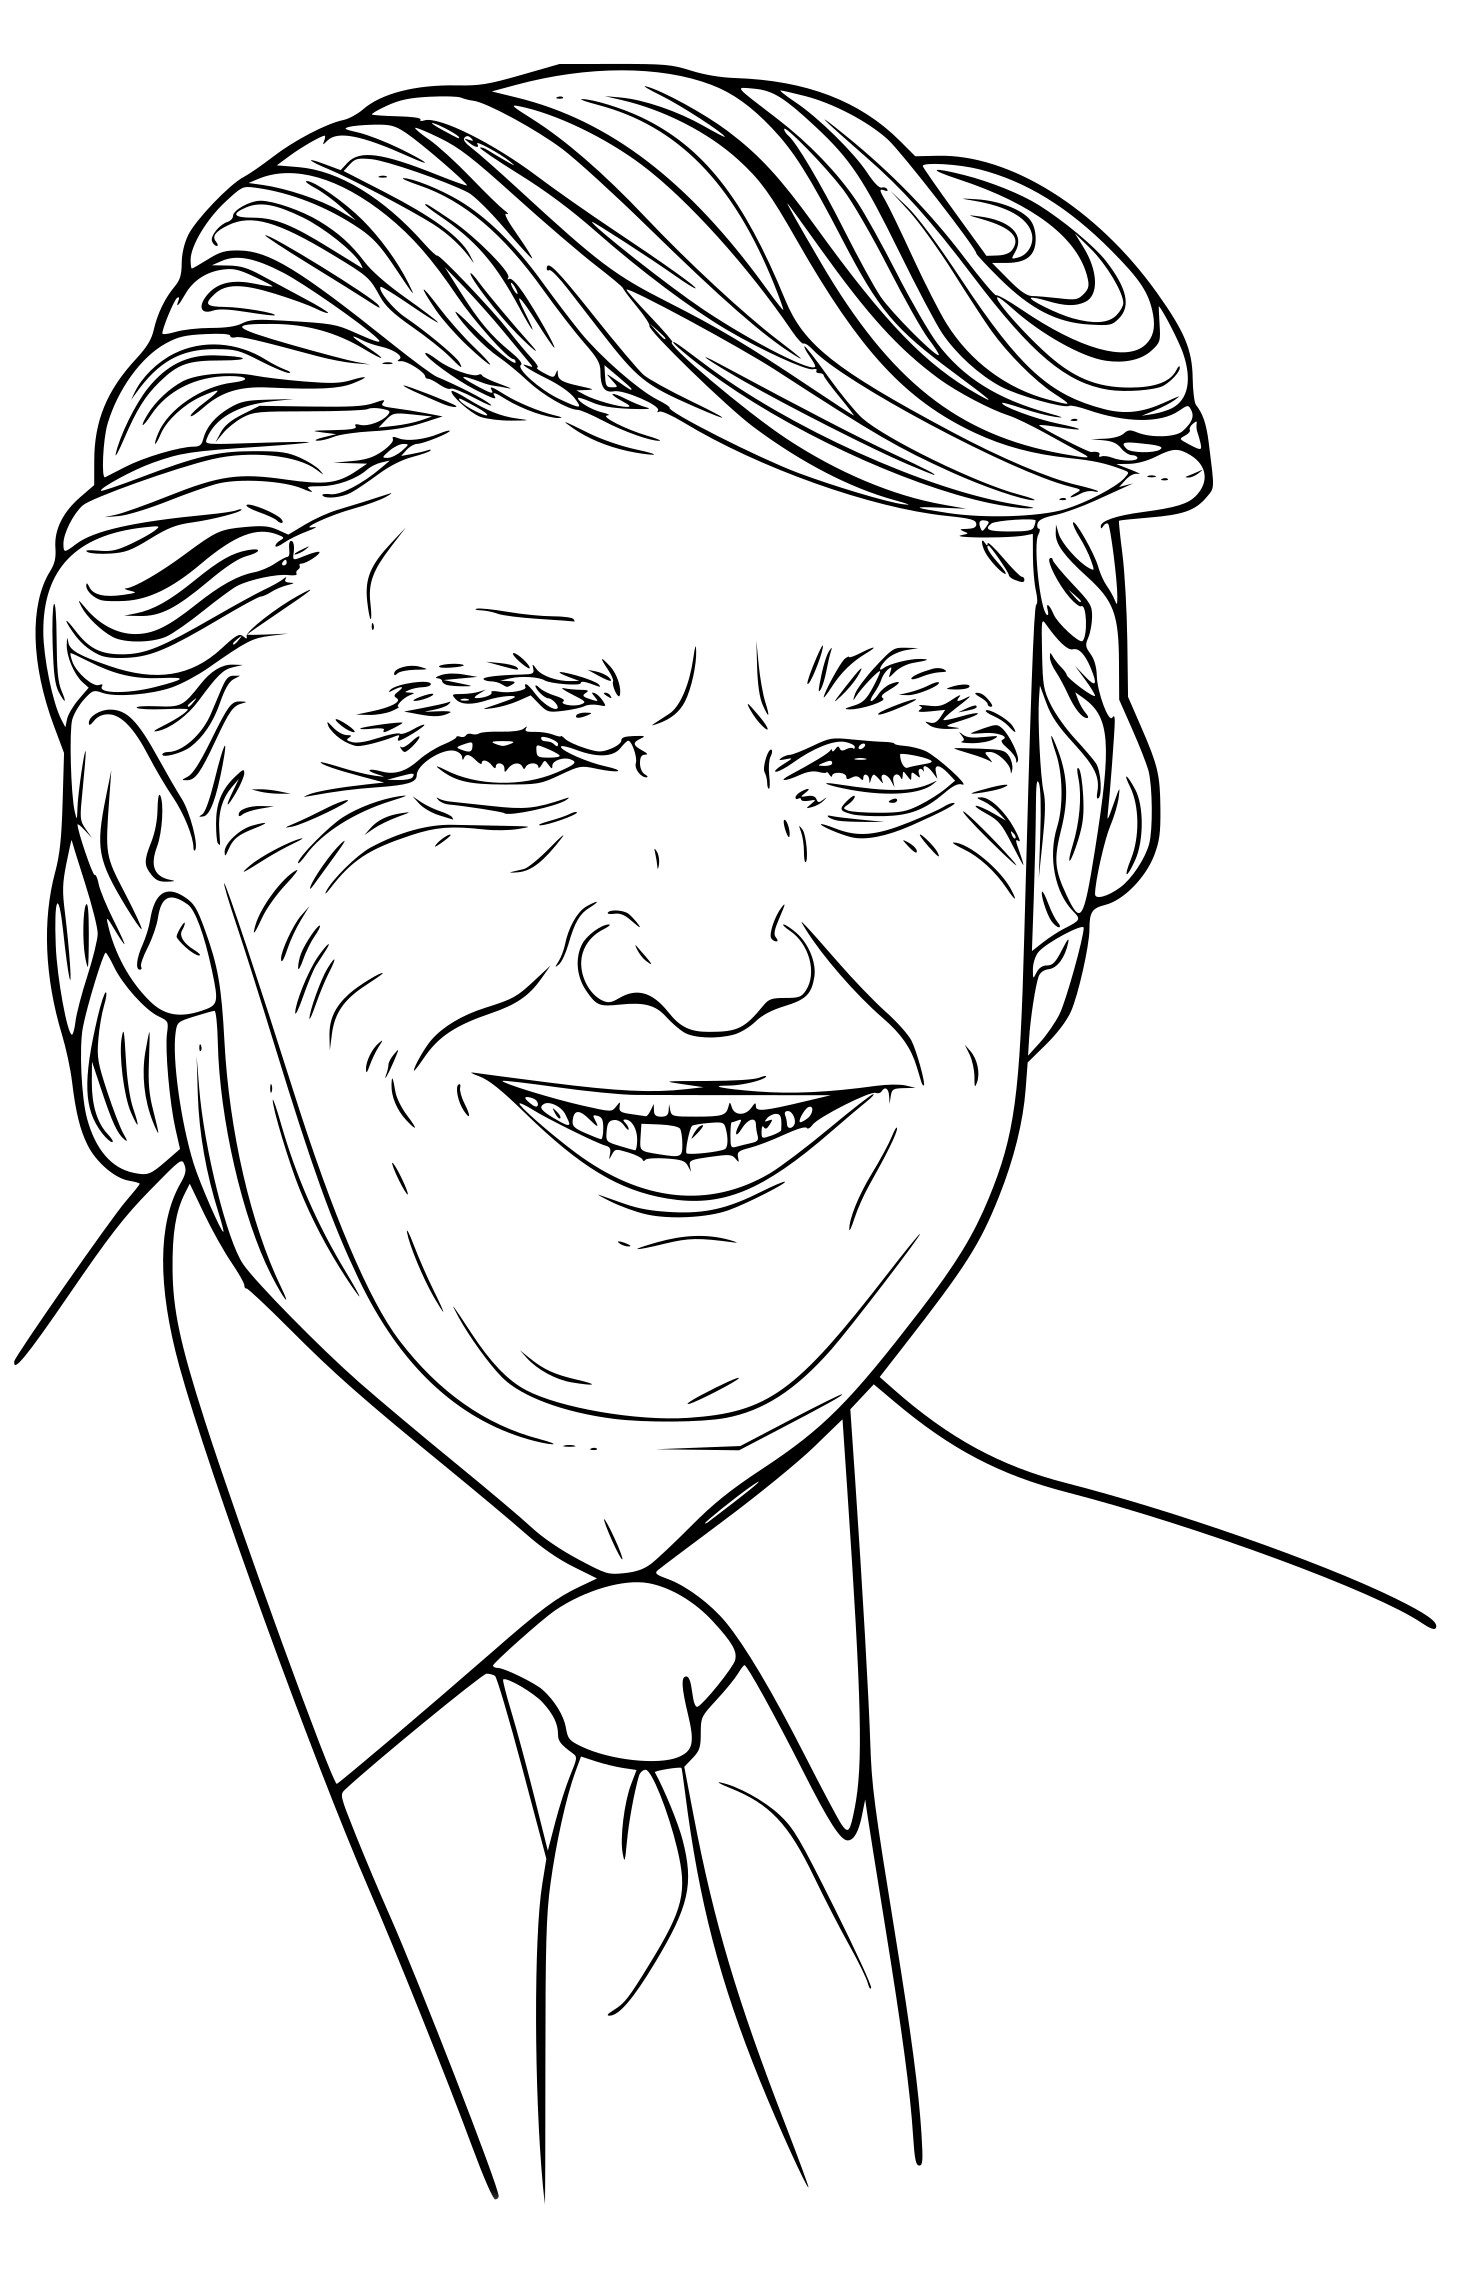 Coloriage Donald Trump à imprimer